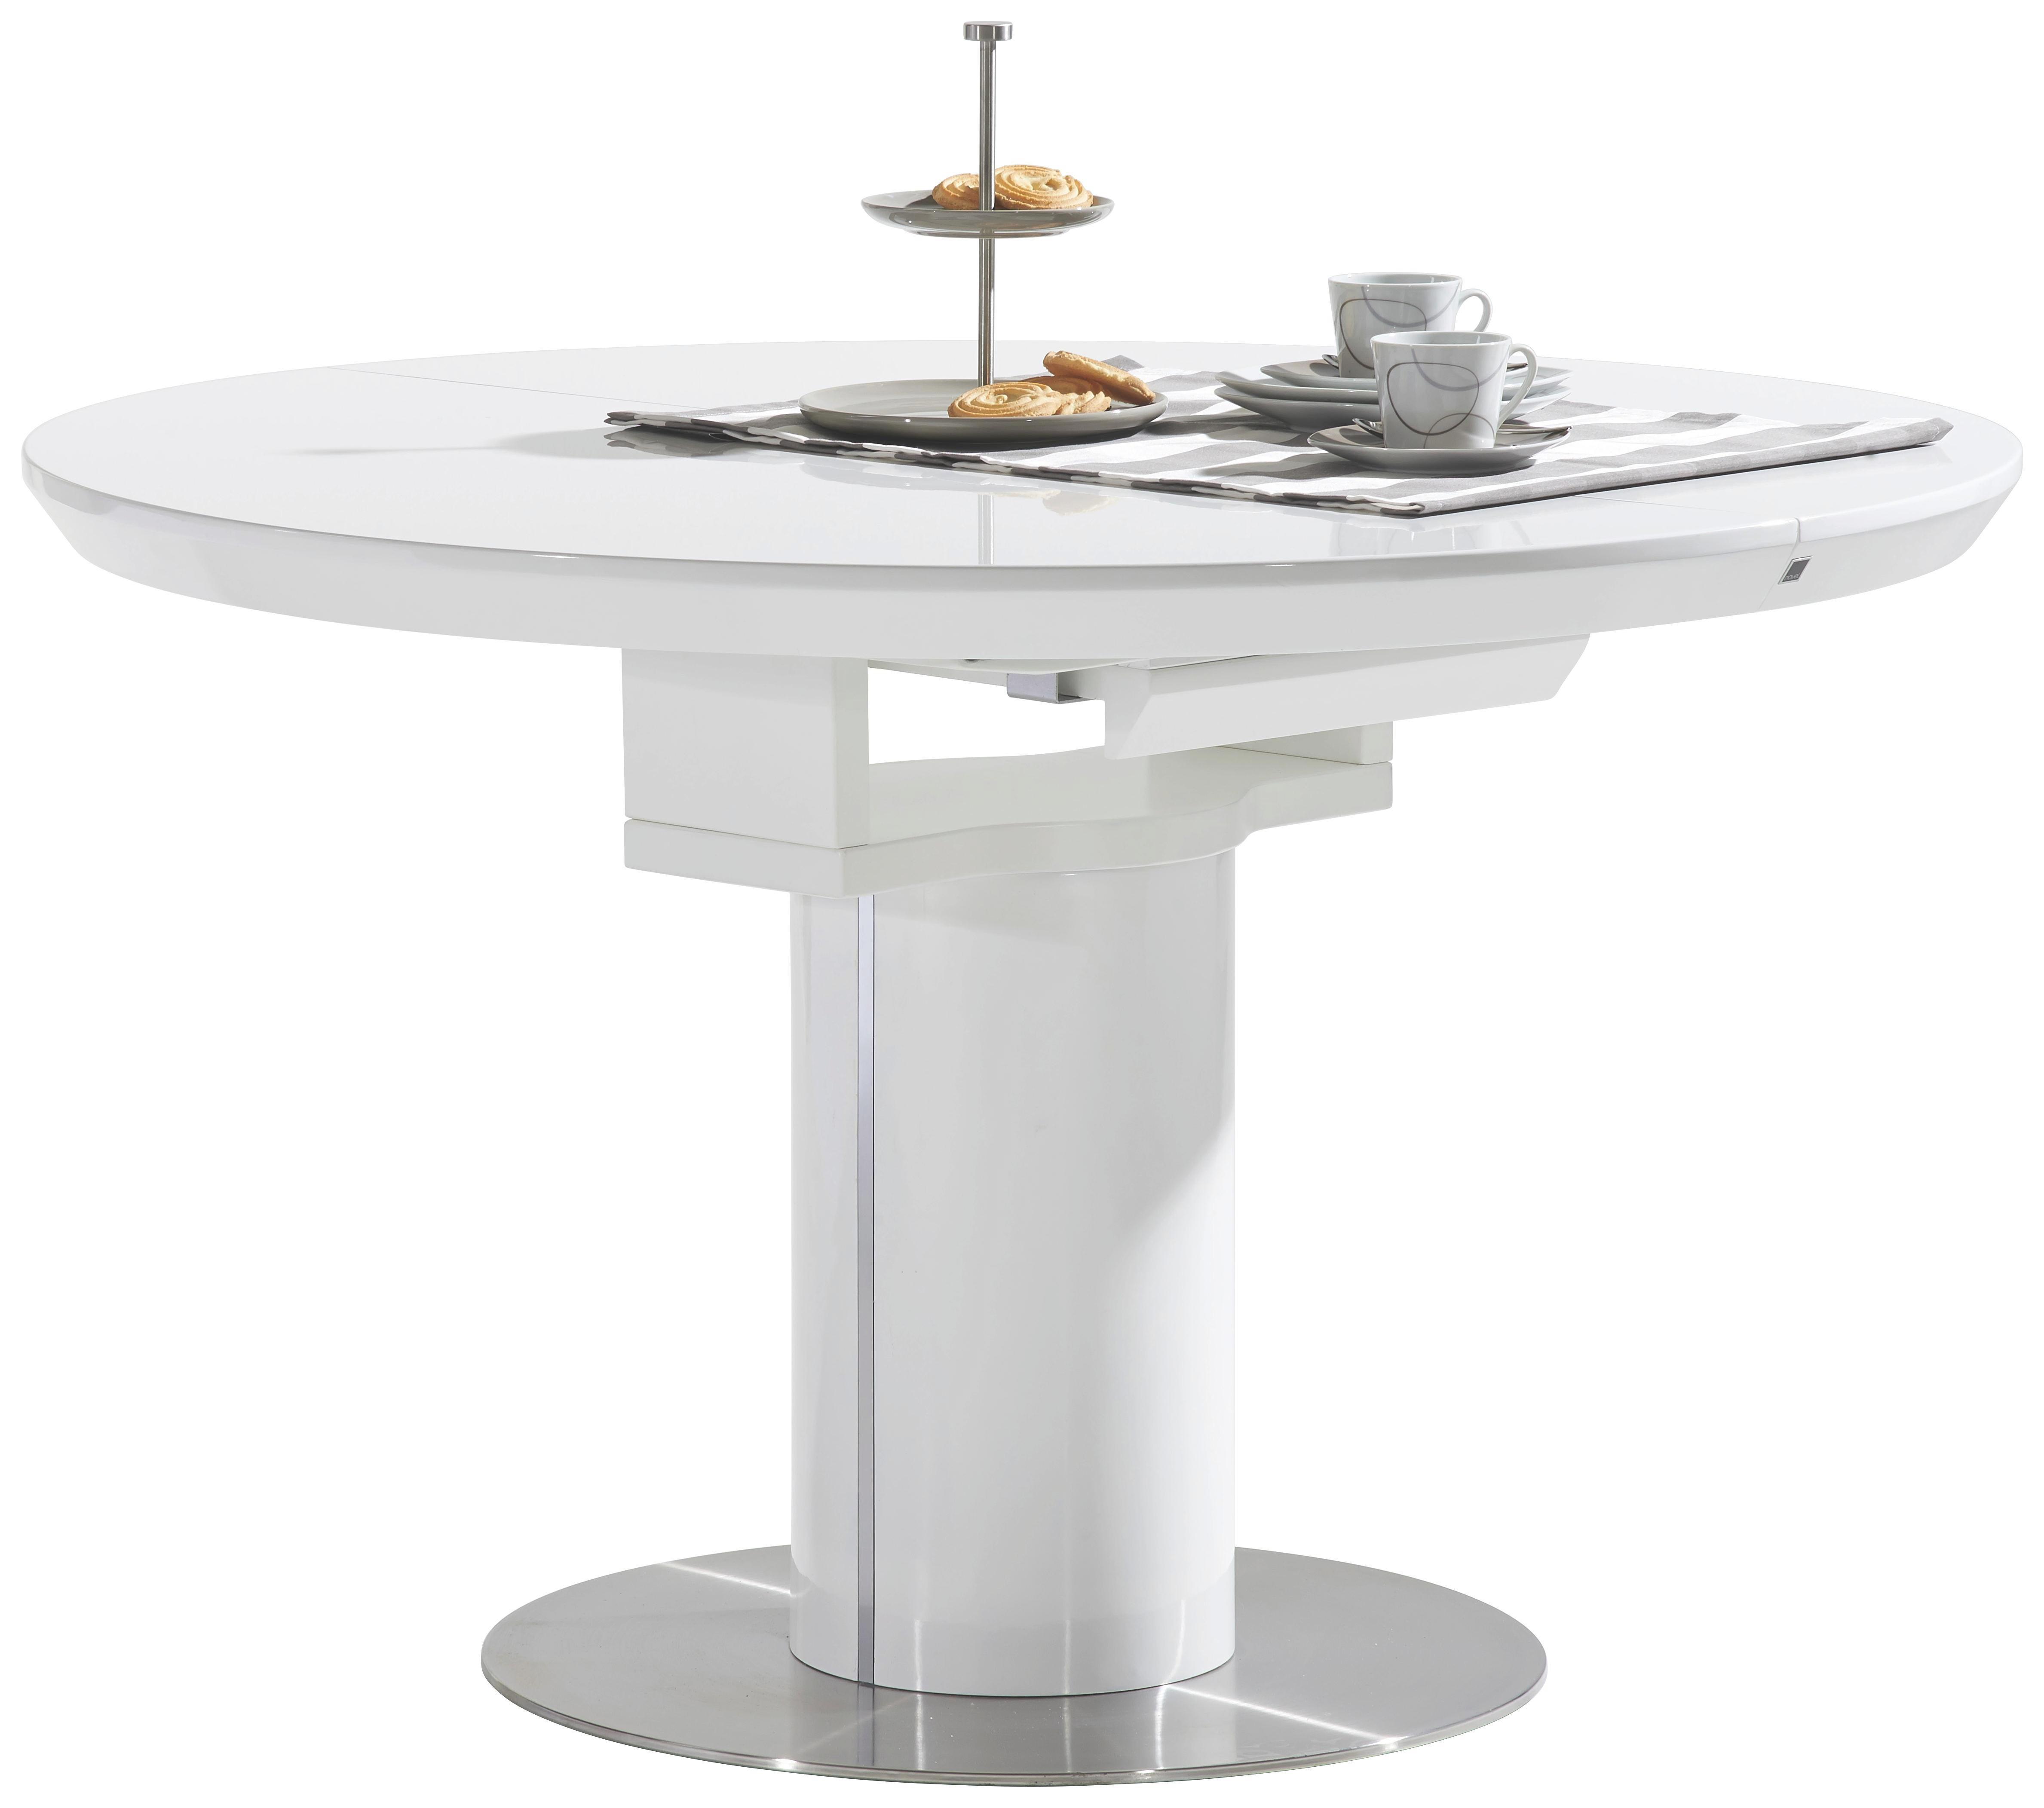 stol - bijela/boje oplemenjenog čelika, Design, drvni materijal/metal (120-160/76/120cm) - NOVEL